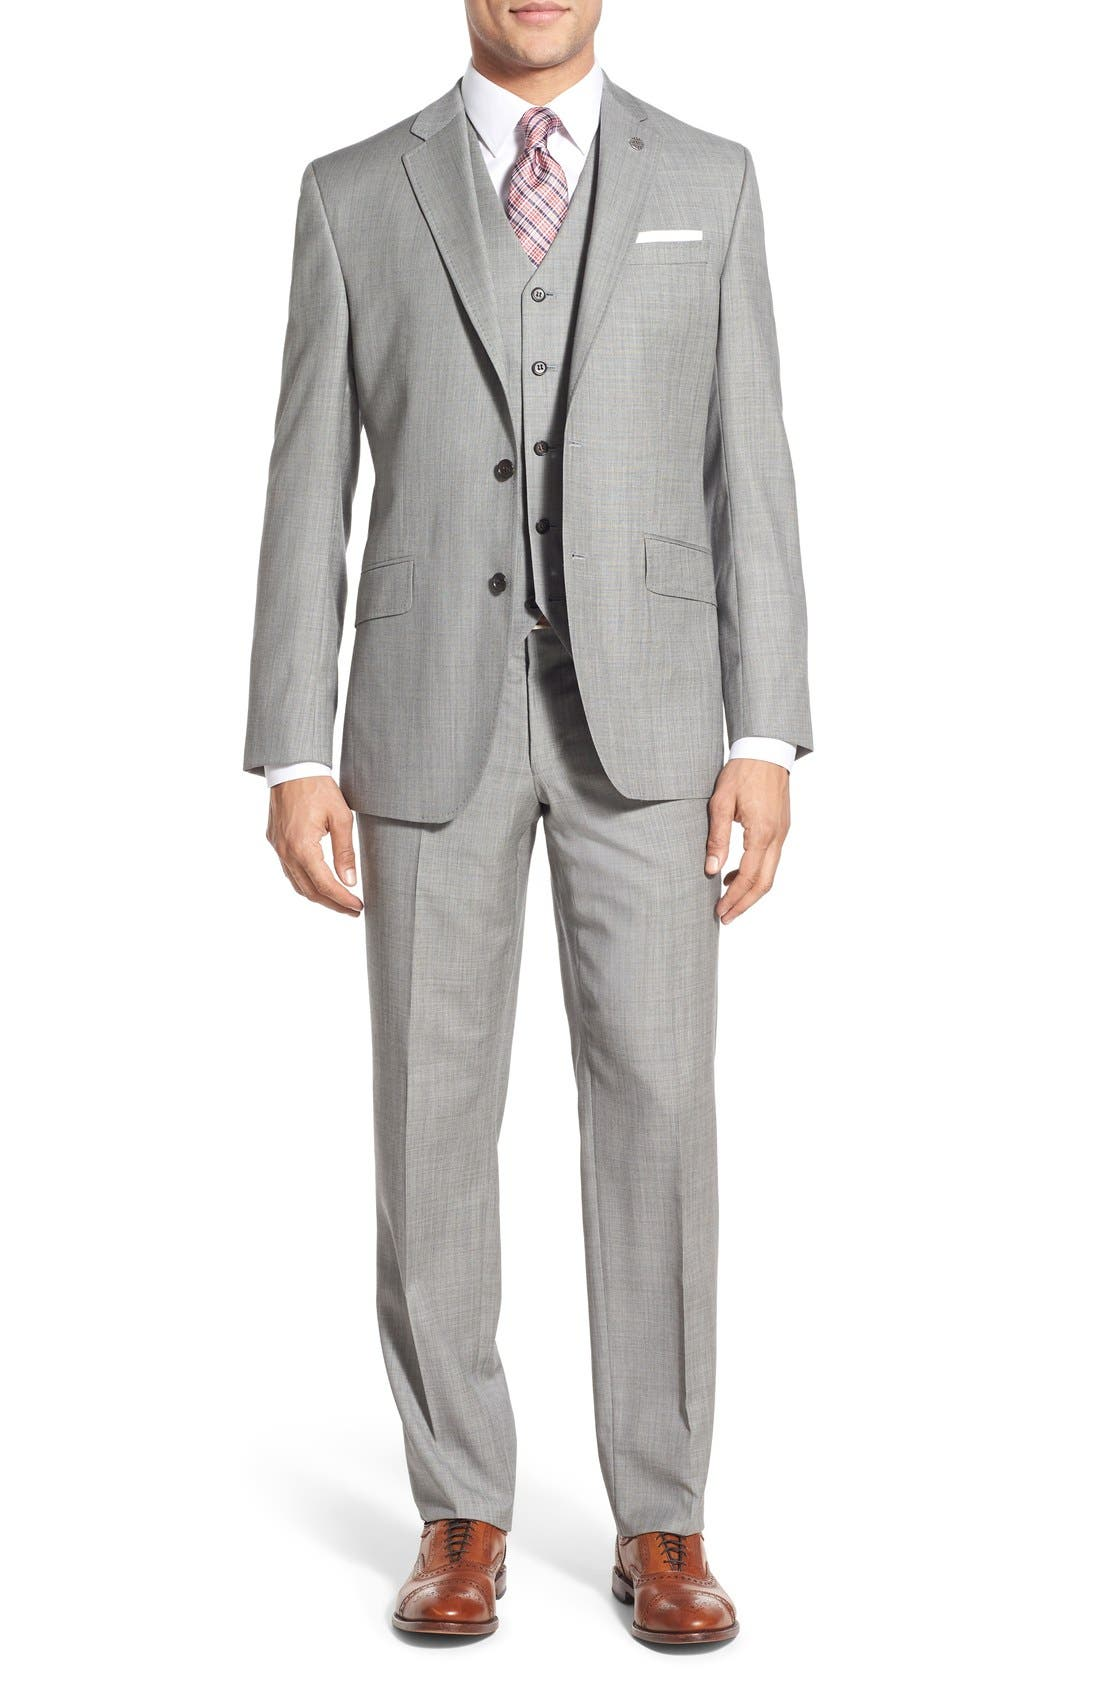 Jones Trim Fit Wool Suit,                             Alternate thumbnail 8, color,                             Medium Grey